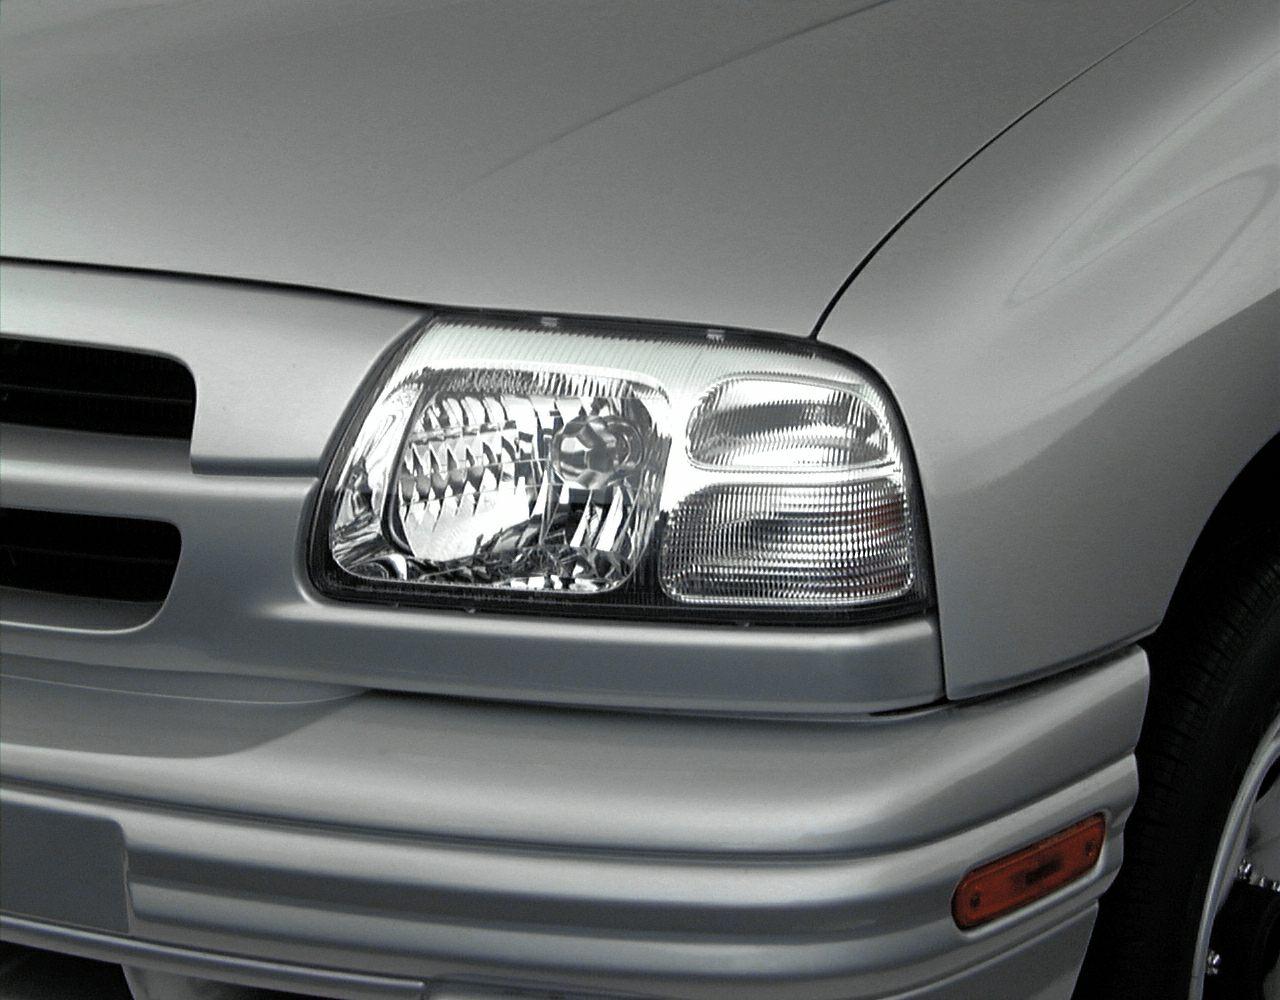 2000 Suzuki Vitara Exterior Photo